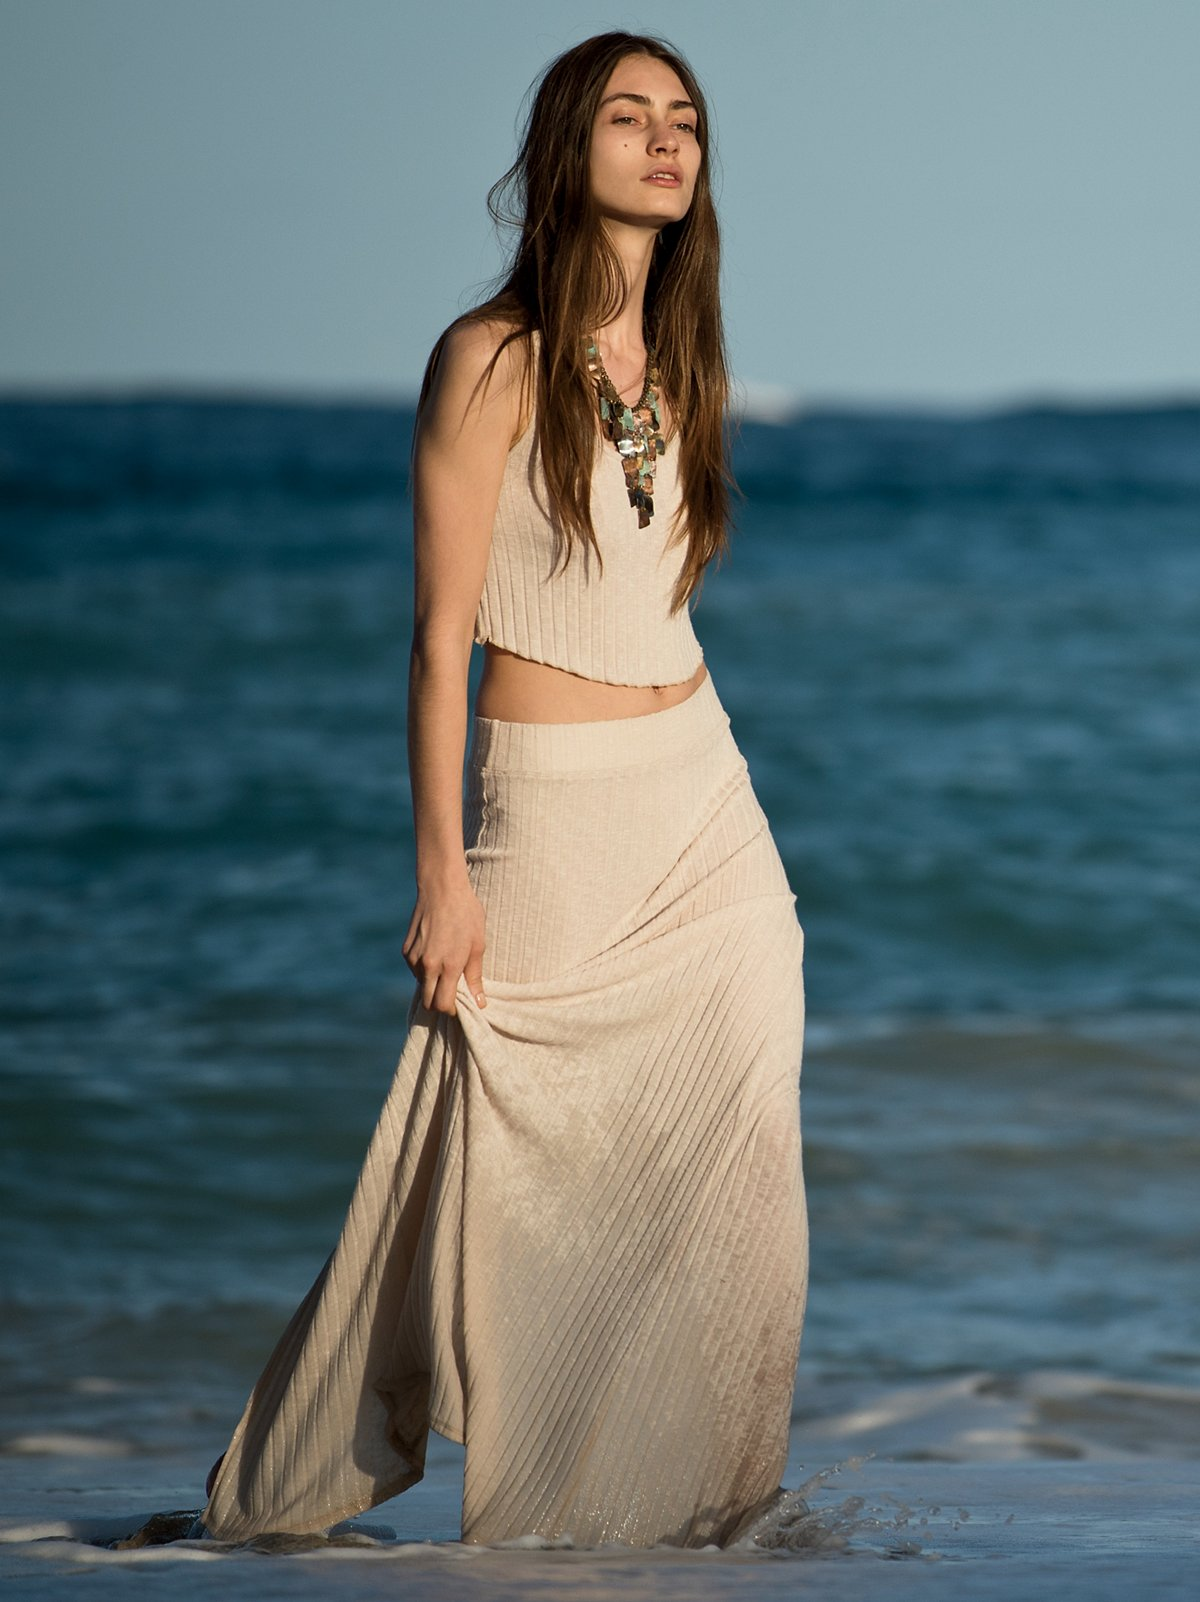 Sandy Beach套装